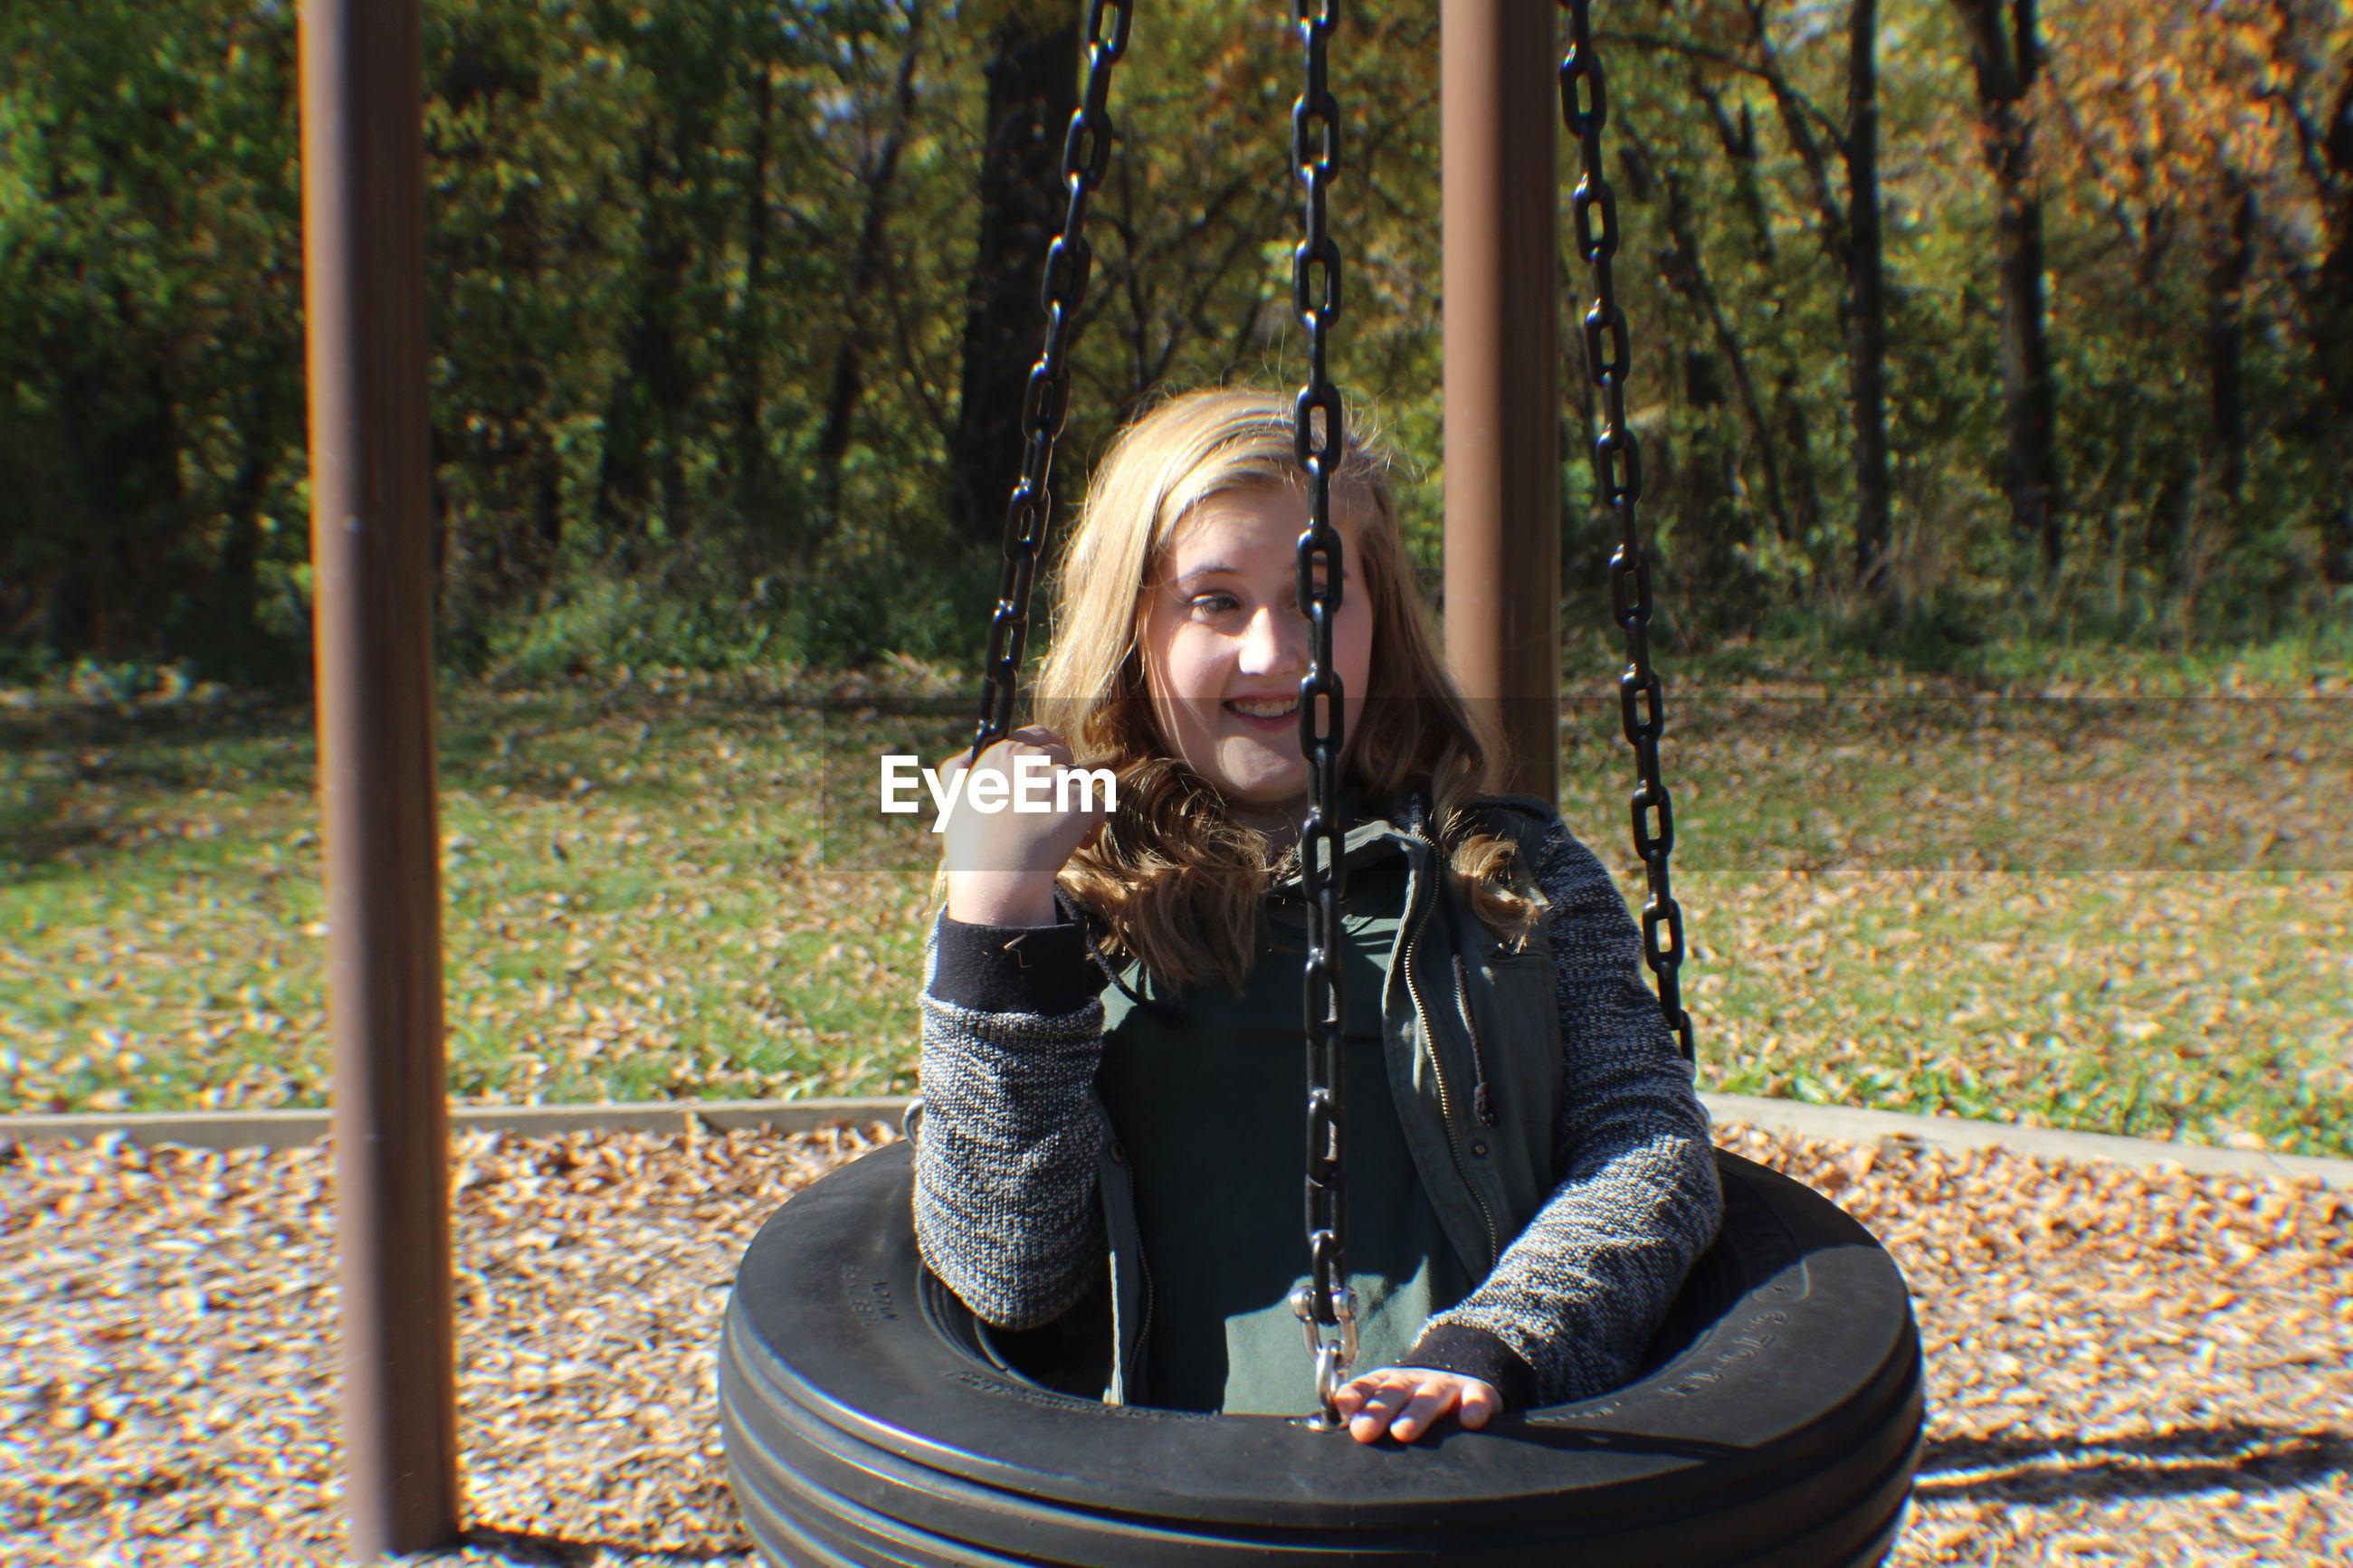 Teenage girl sitting on tire swing